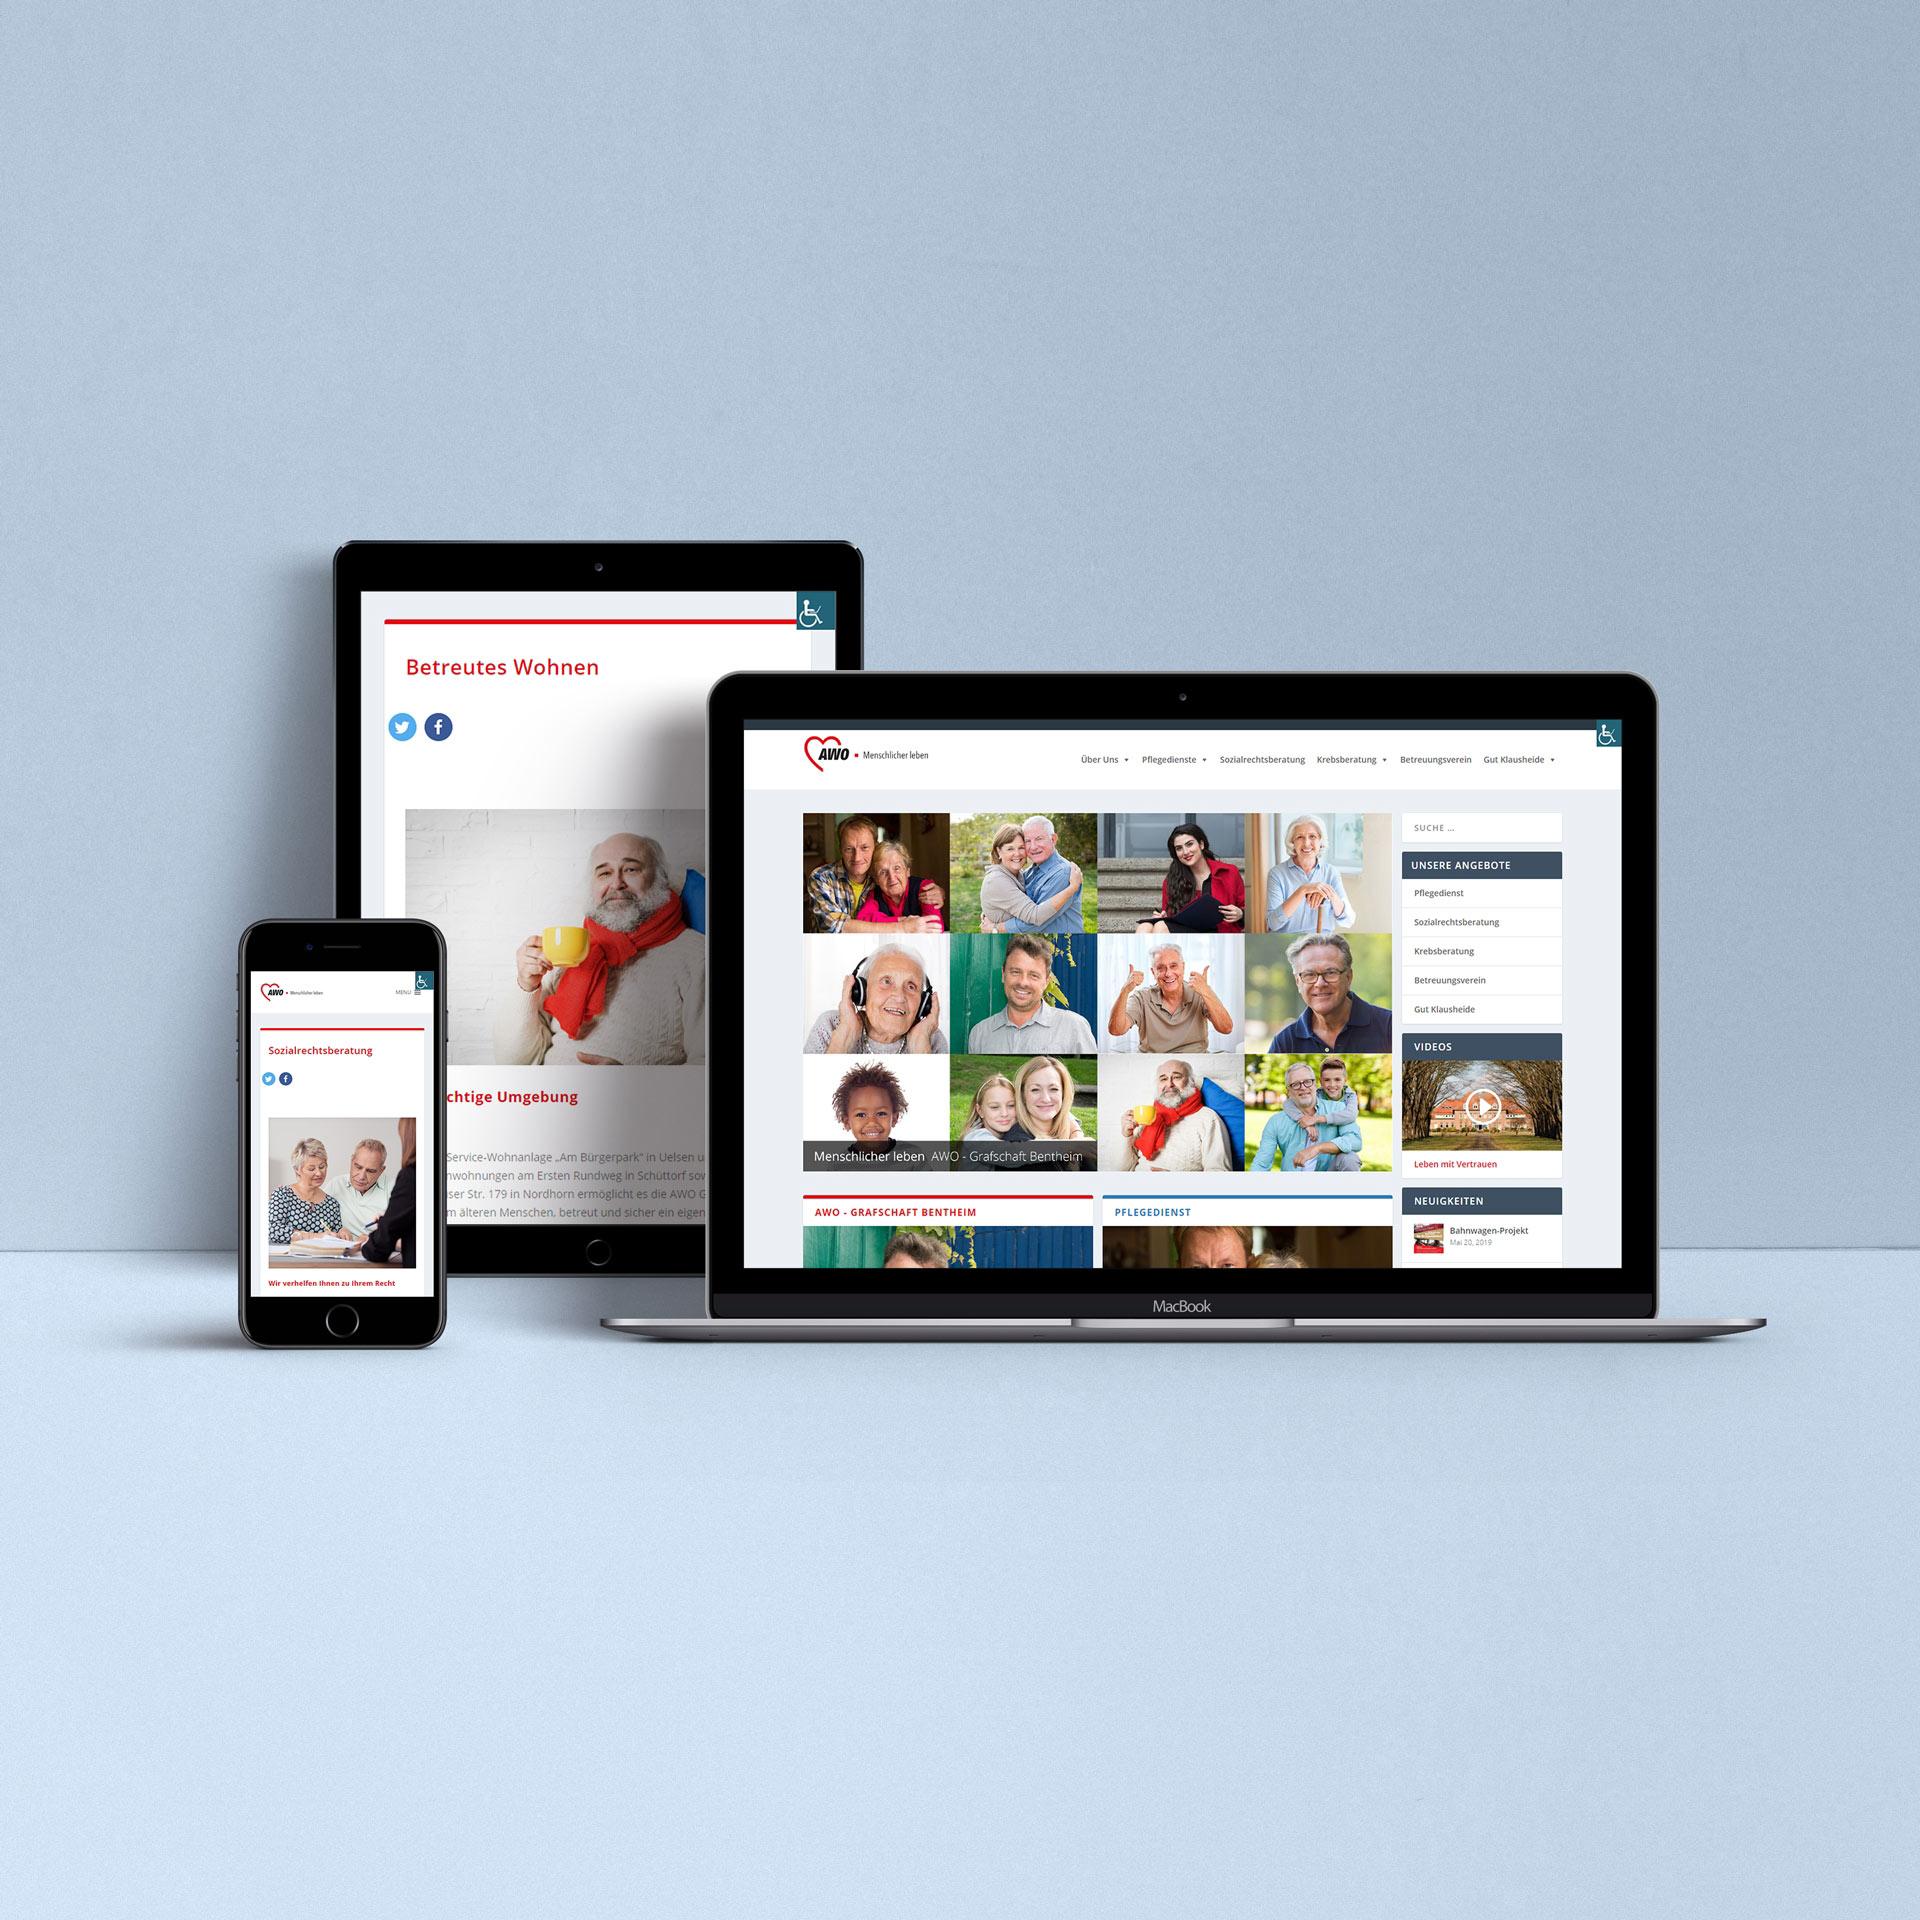 freiSign Werbeagentur Nordhorn: Webgestaltung